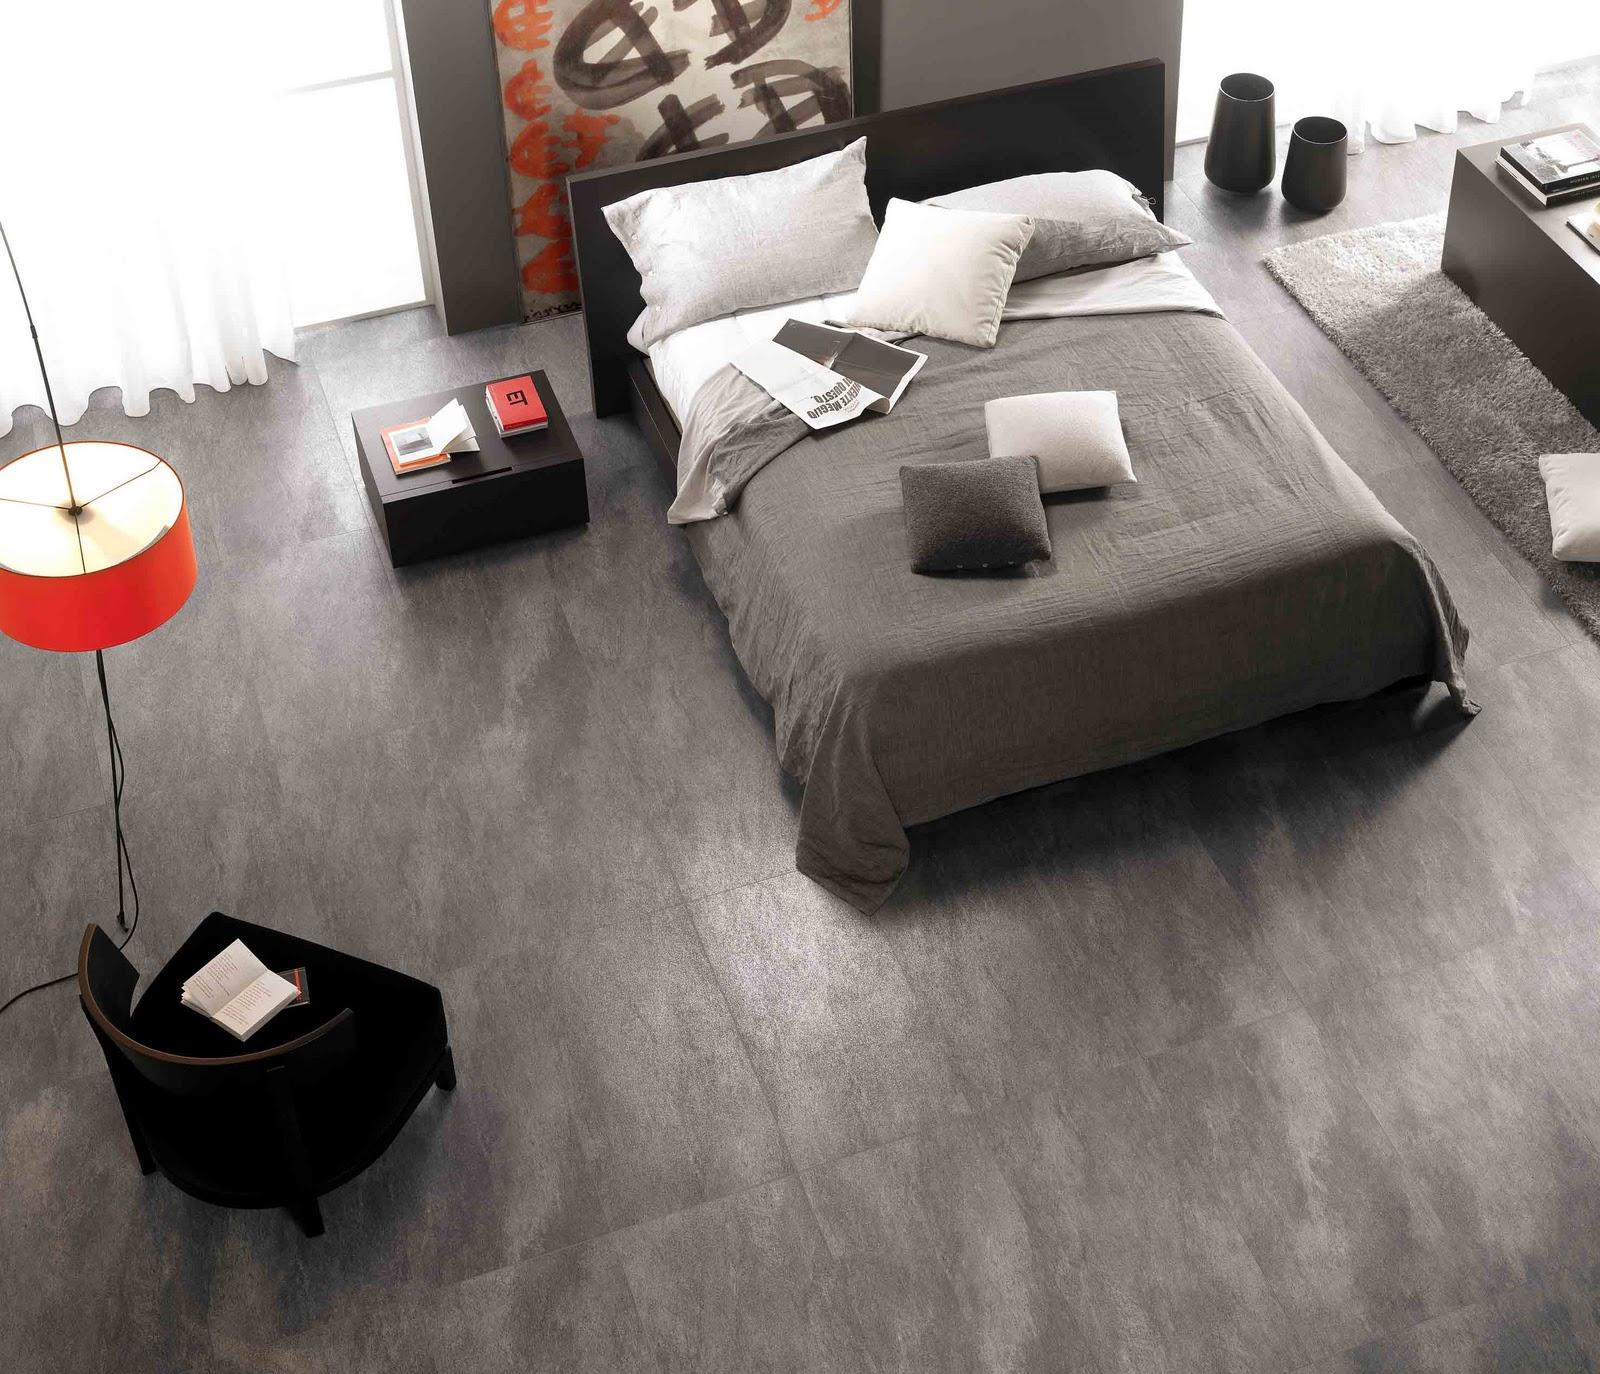 Pavimenti moderni imola ceramica cersaie 2010 for Interni case moderne pietra